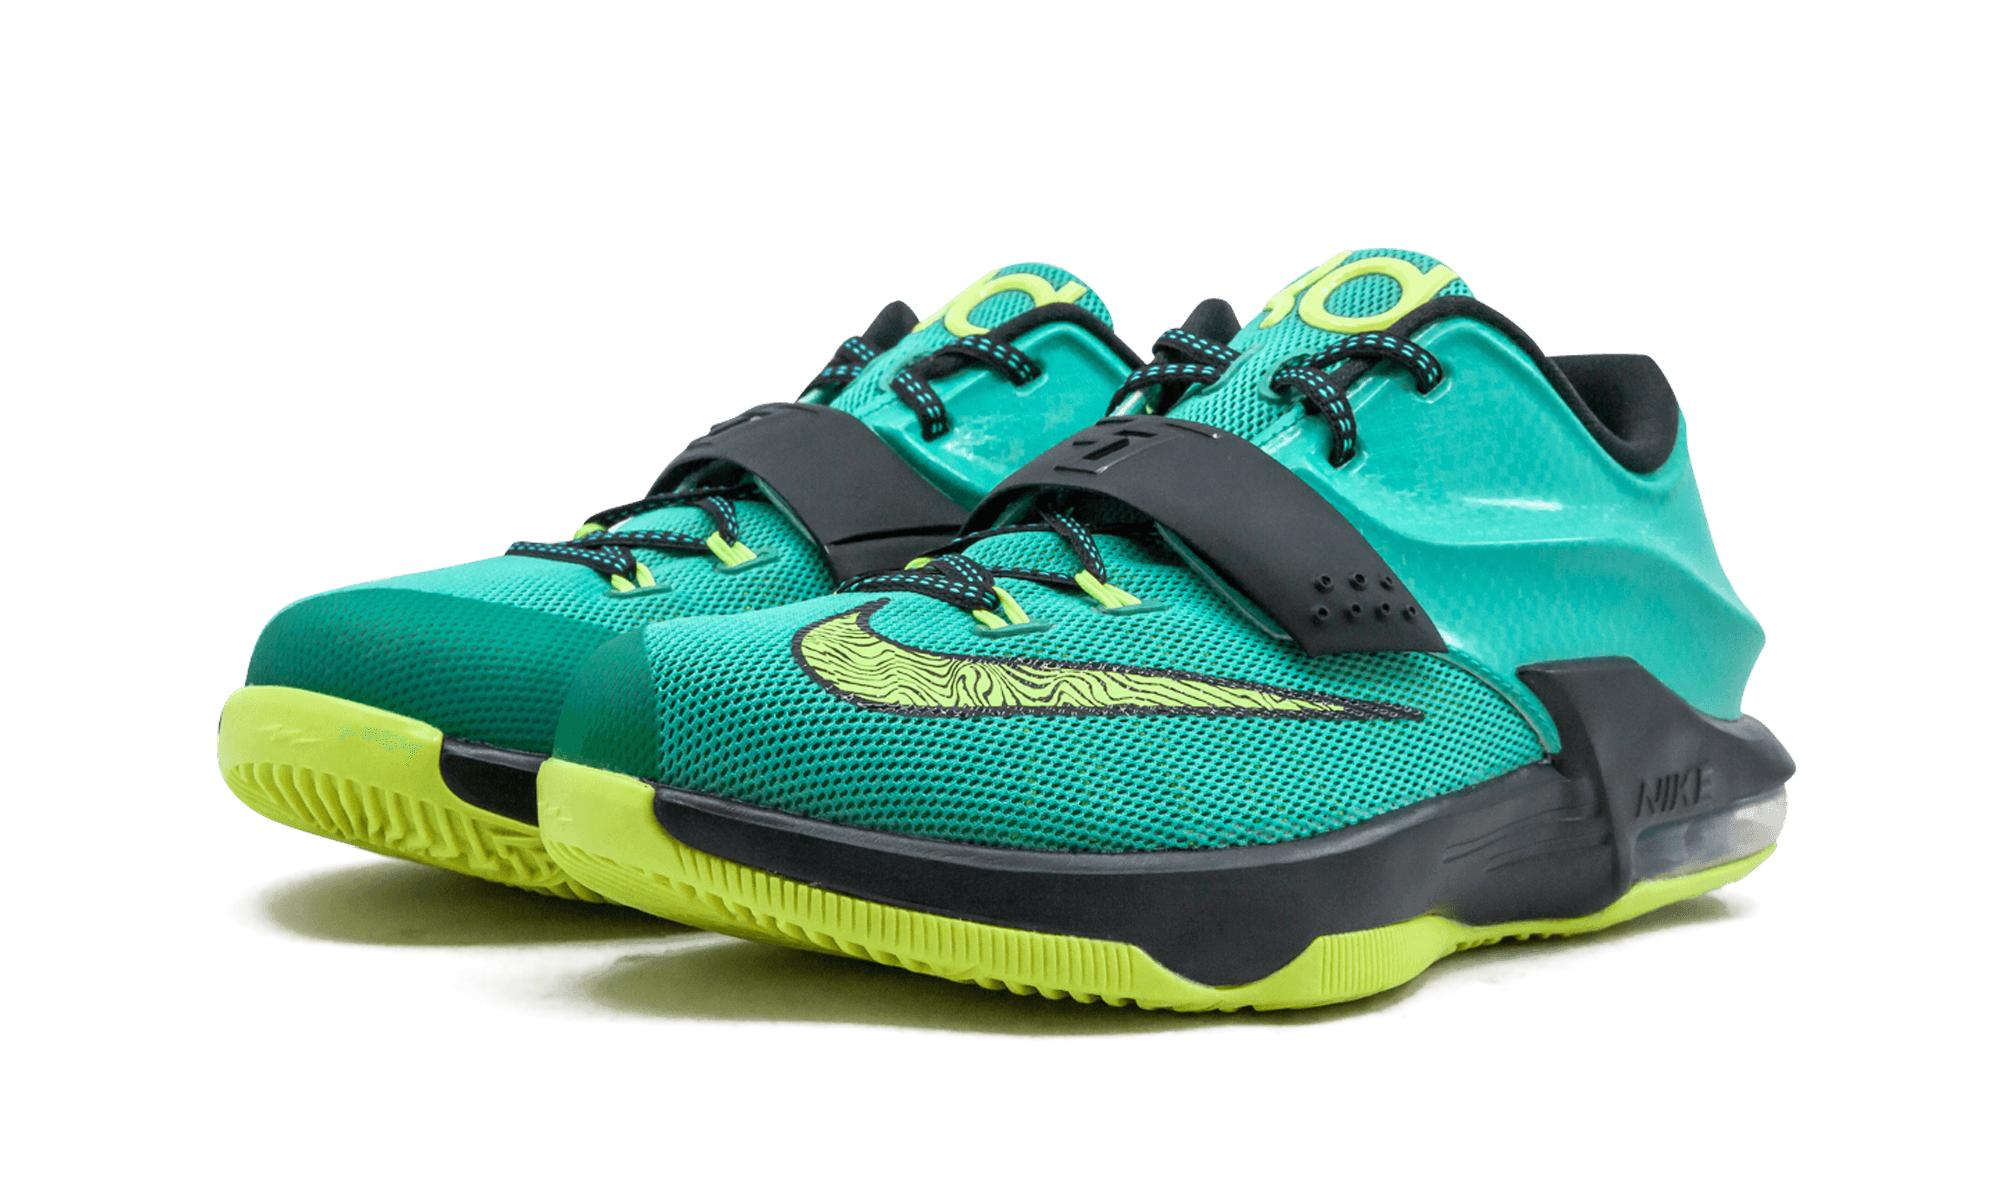 57b682f33d6d Nike - Blue Kd 7 (gs) for Men - Lyst. View fullscreen